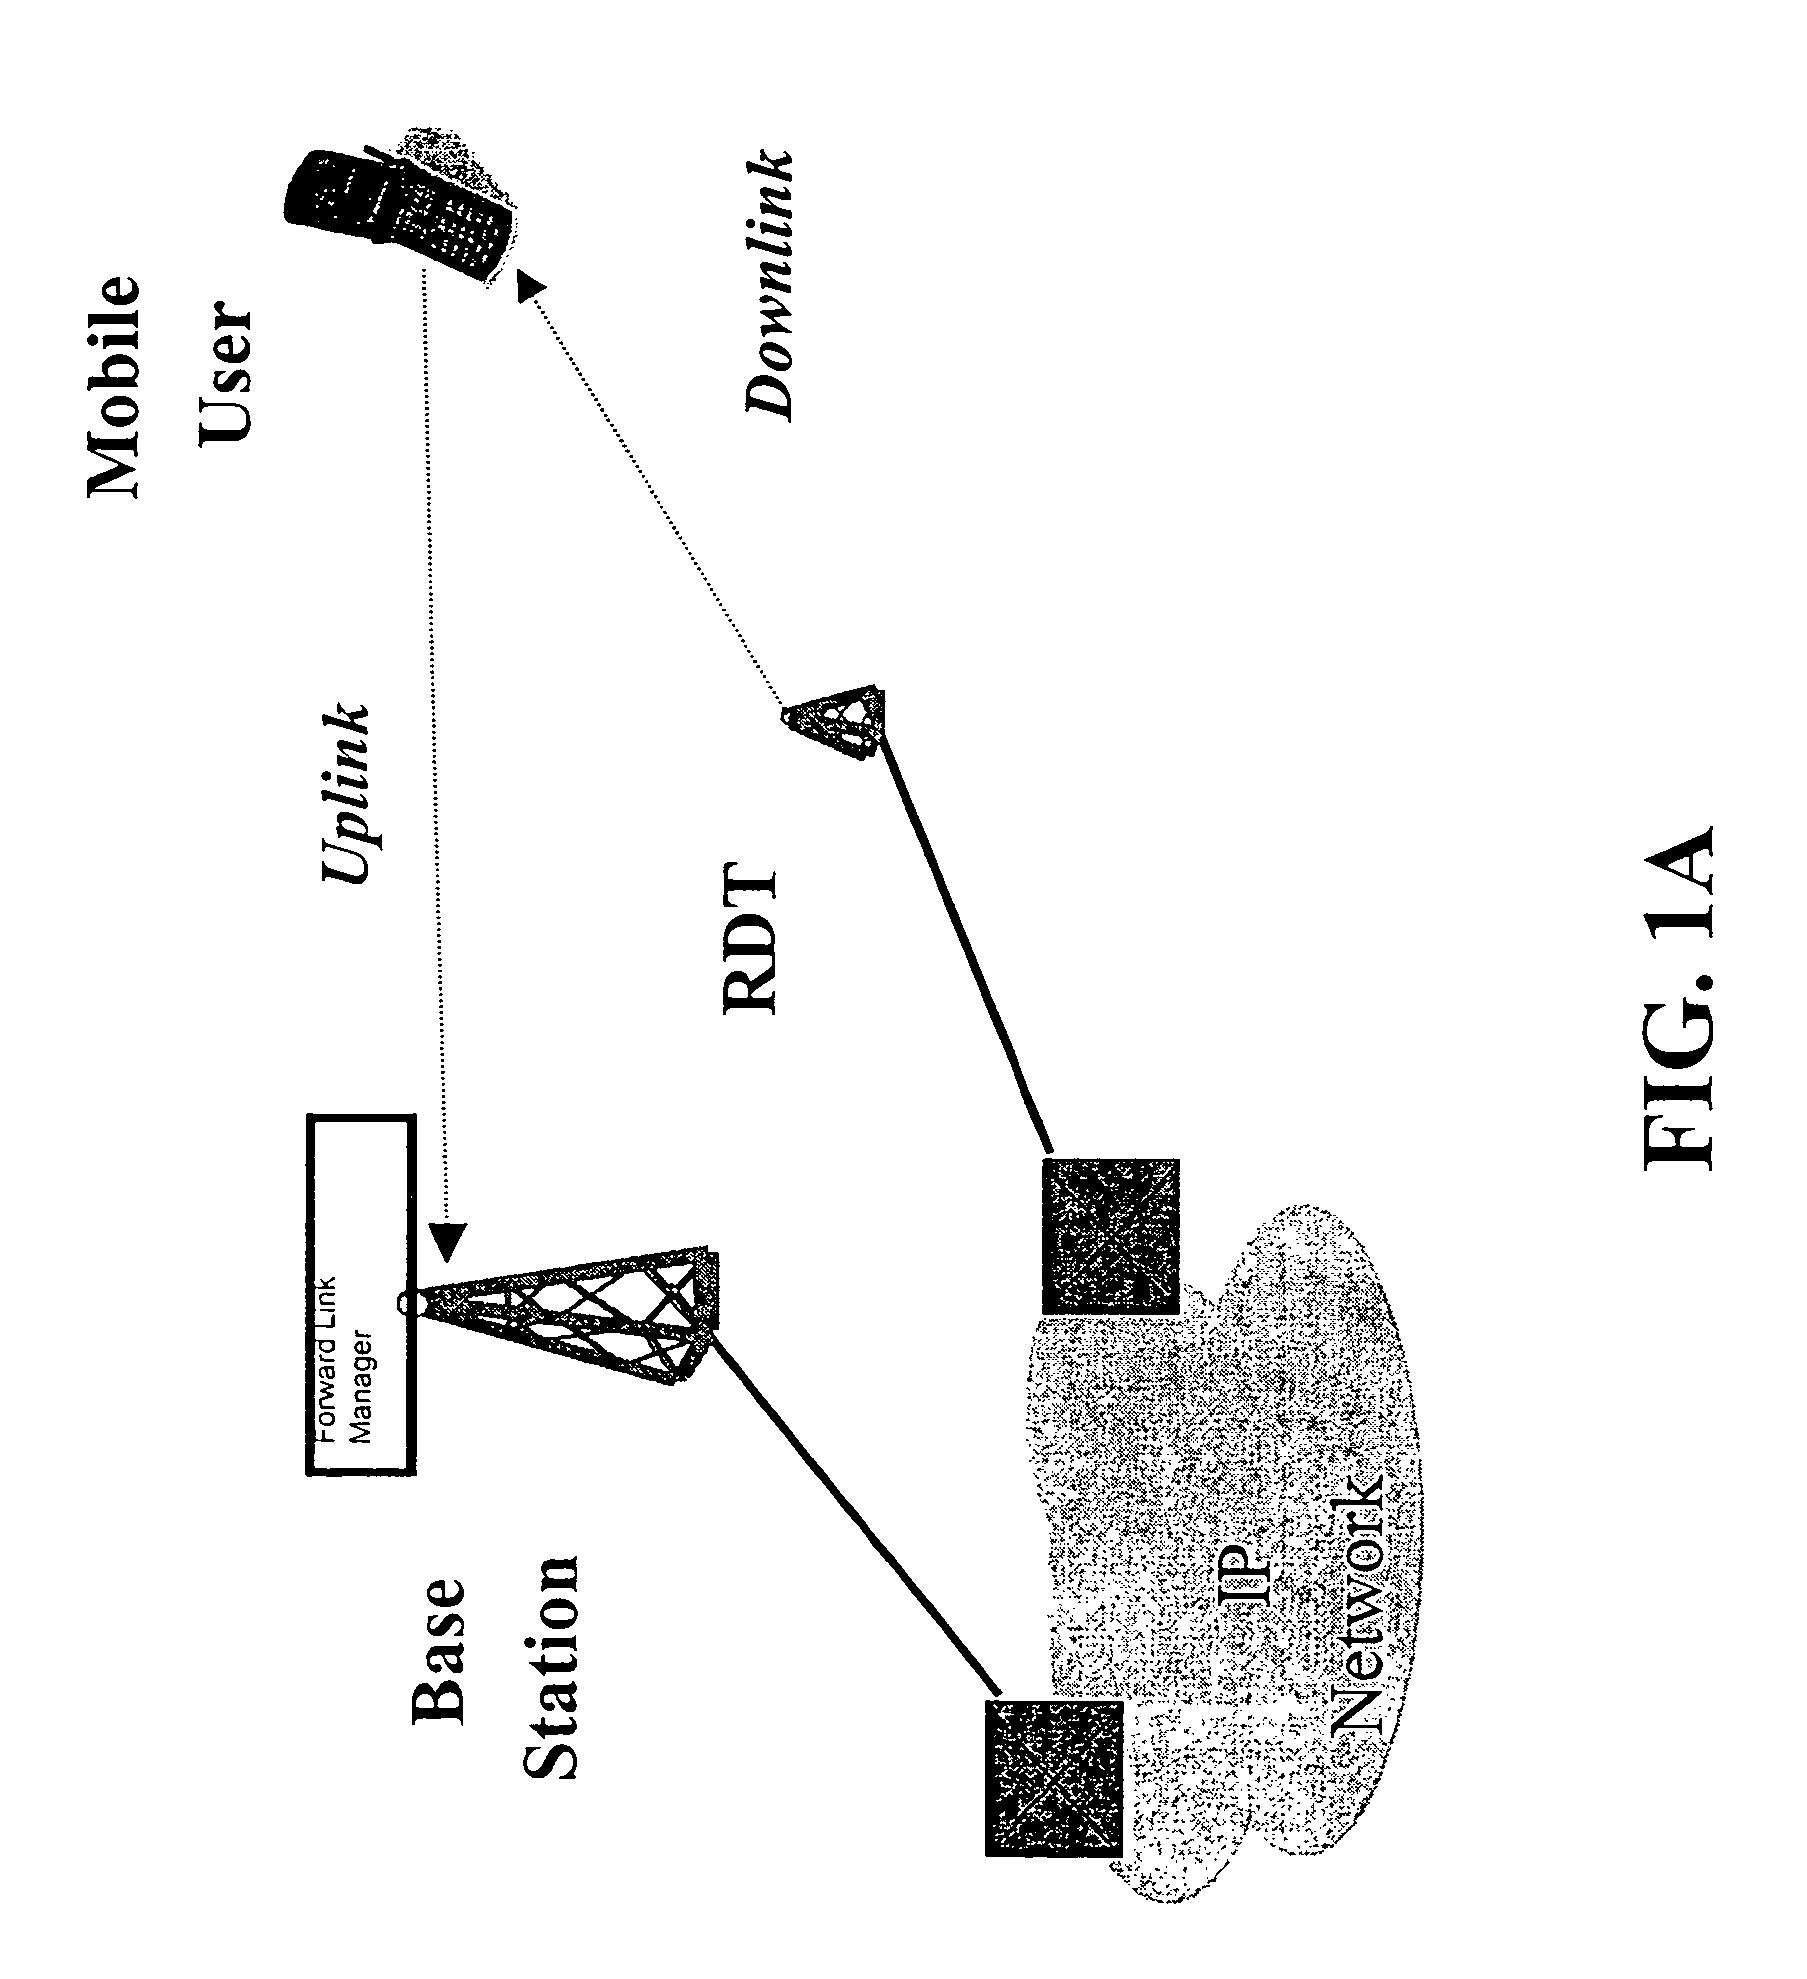 Wireless Signal Channel